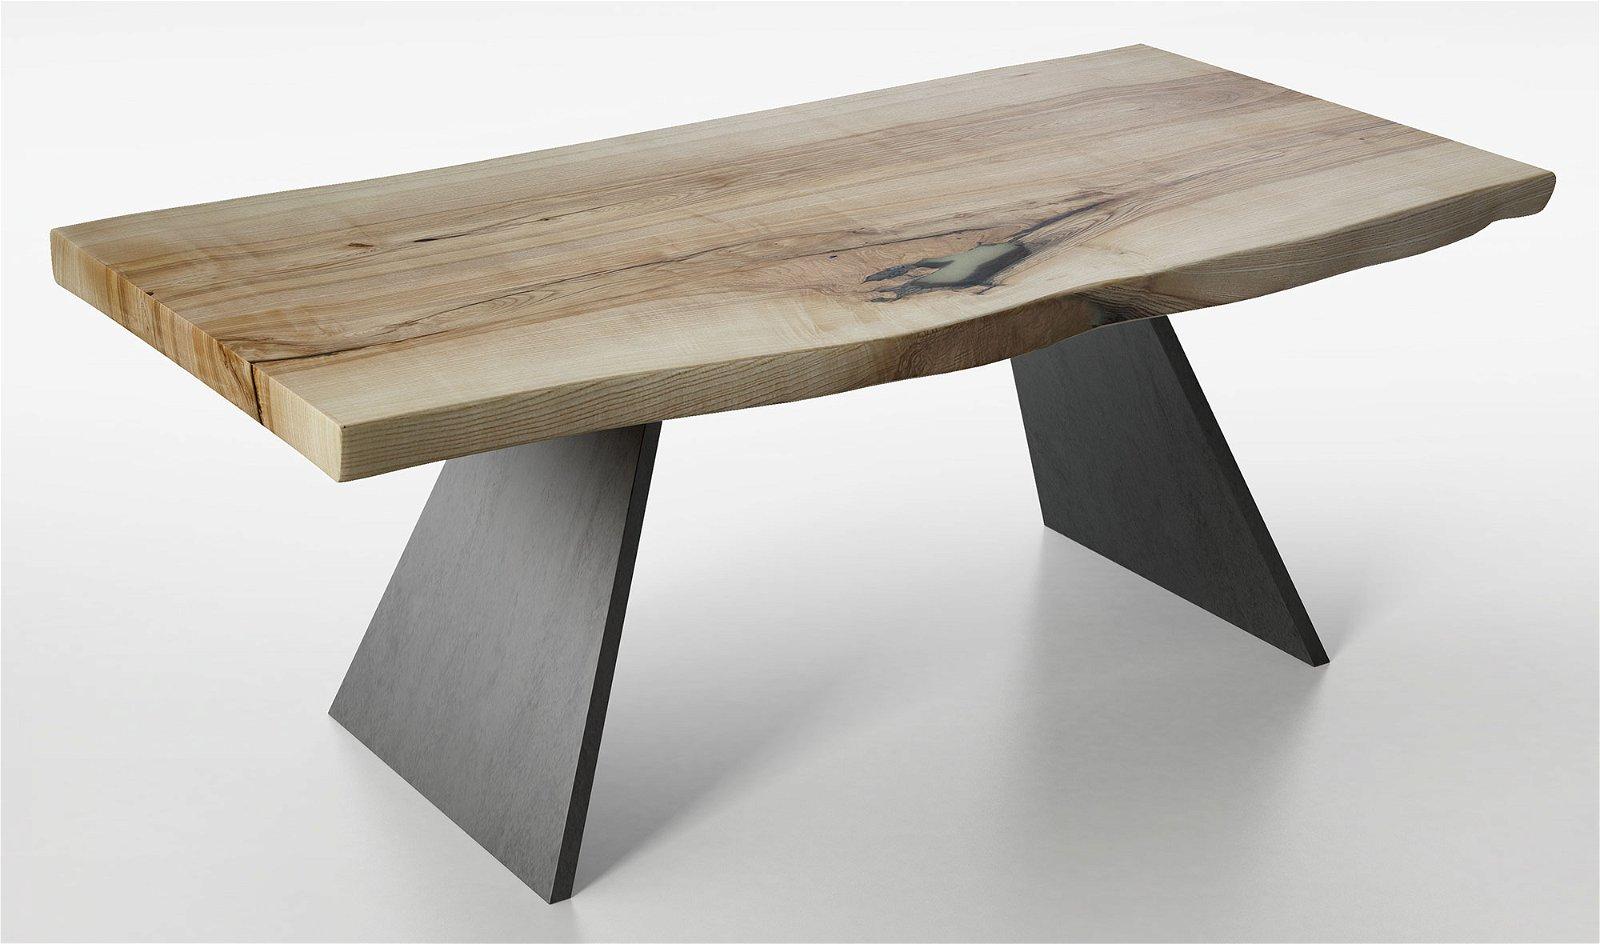 Mesa de comedor madera maciza fresno Teleorman